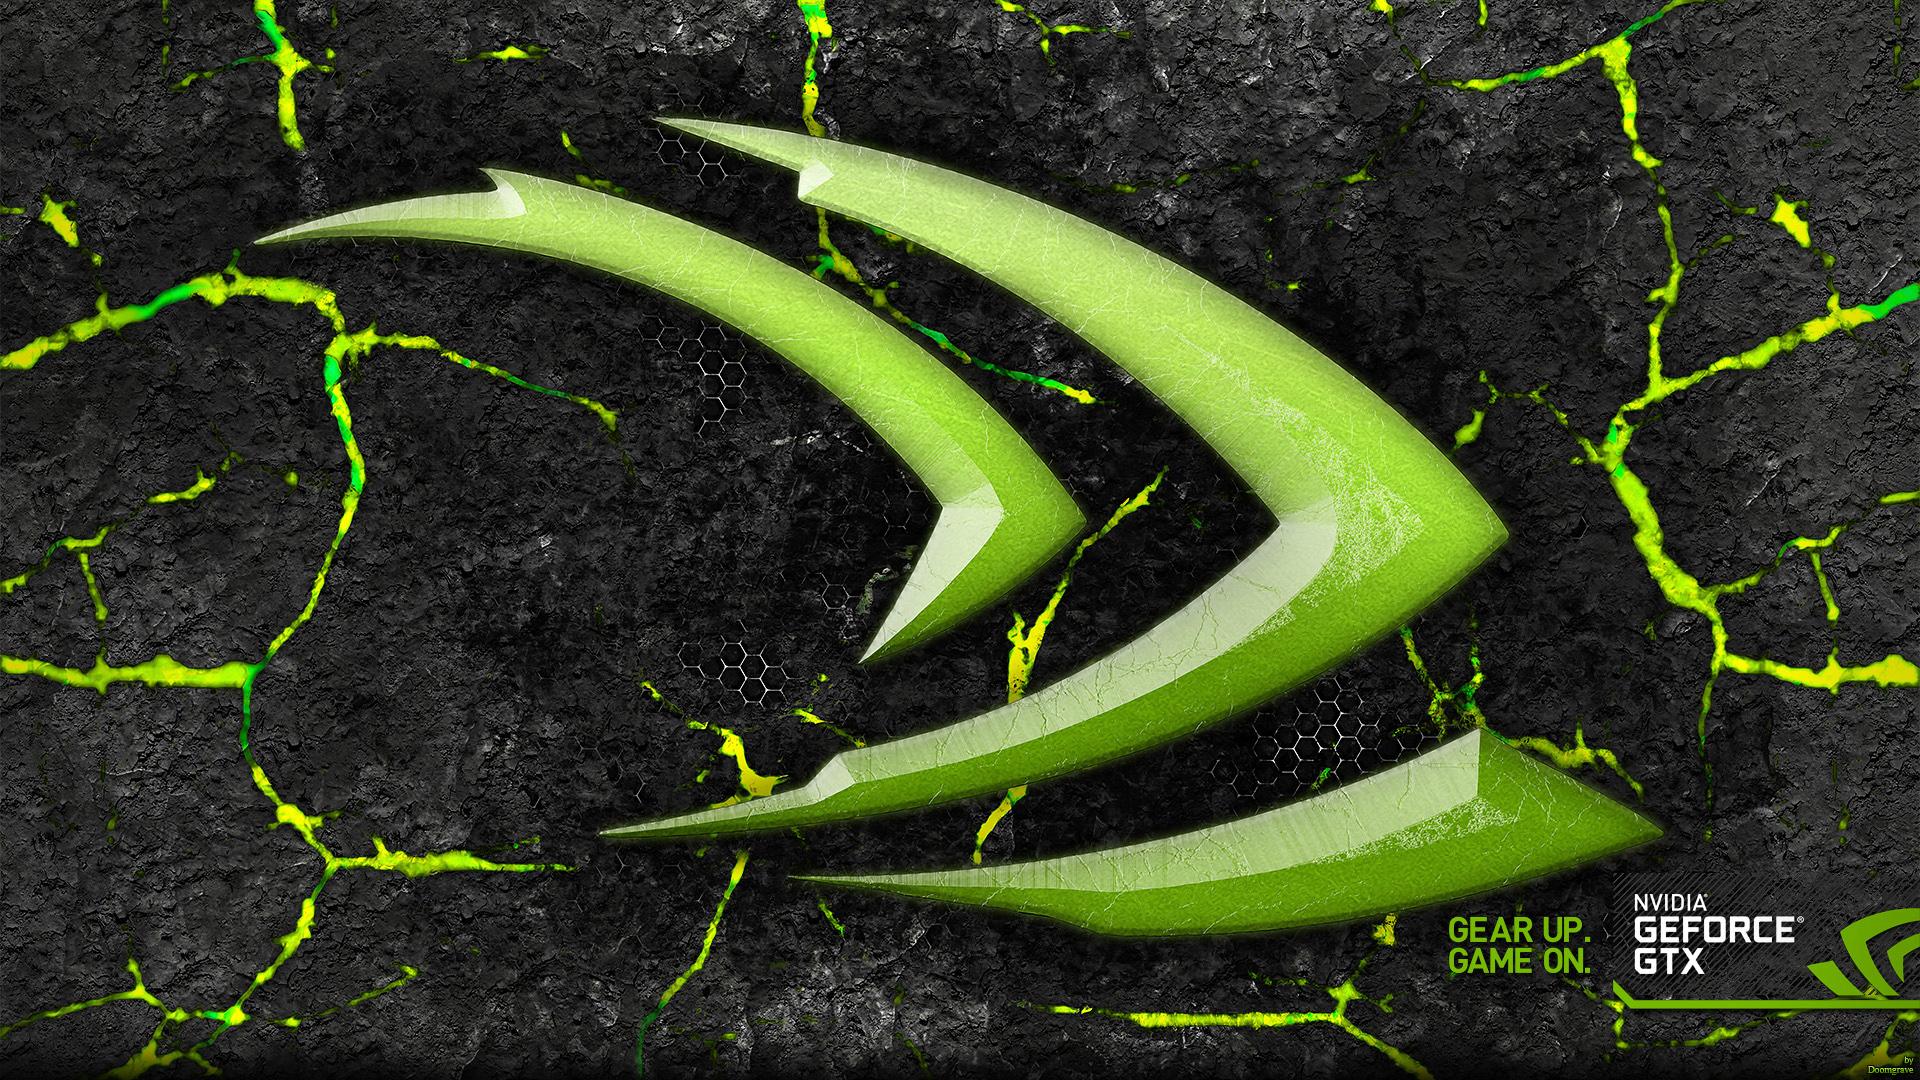 Nvidia [19] wallpaper - Computer wallpapers - #45889